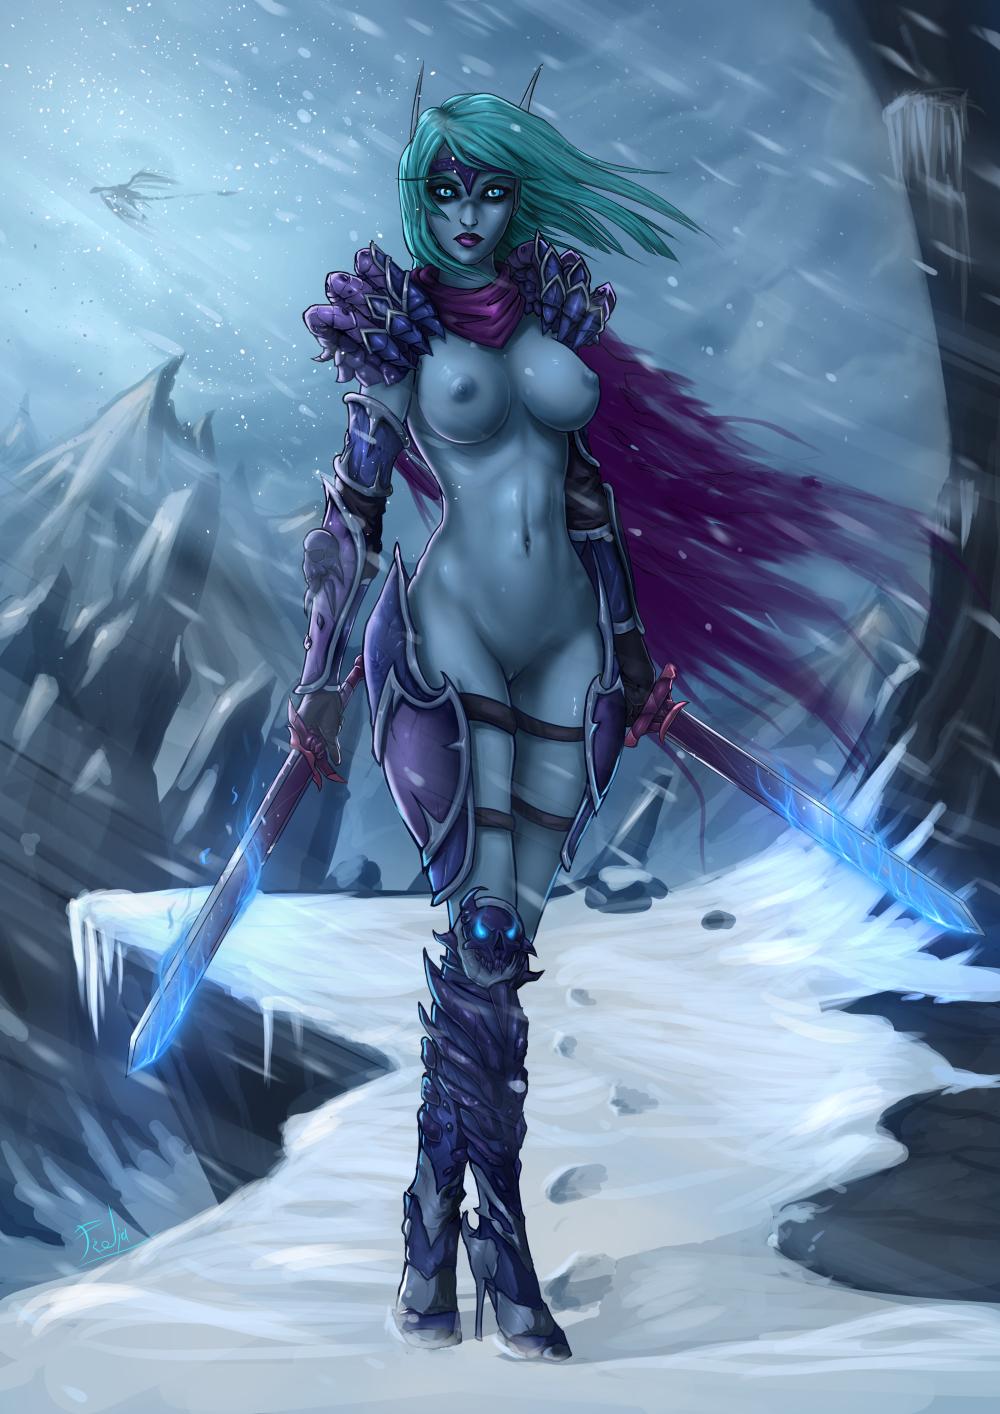 blood elf world warcraft porn of No game no life rl